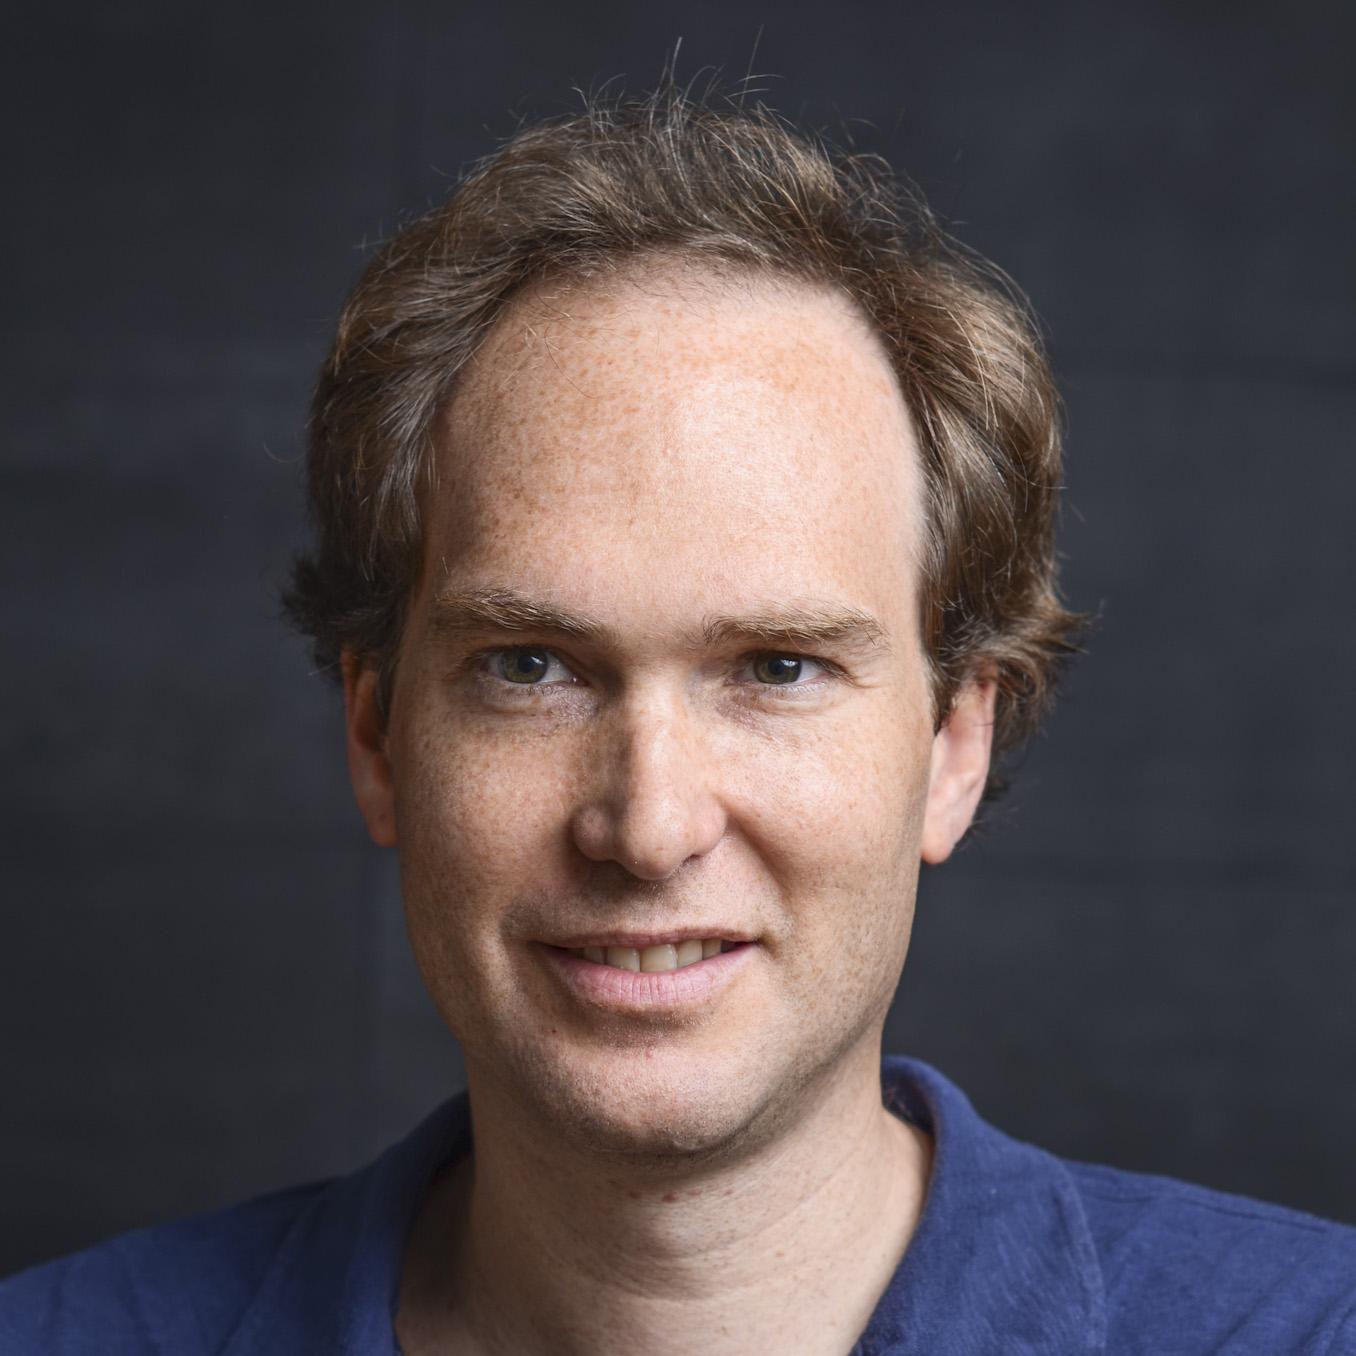 Leopoldo Petreanu, PhD